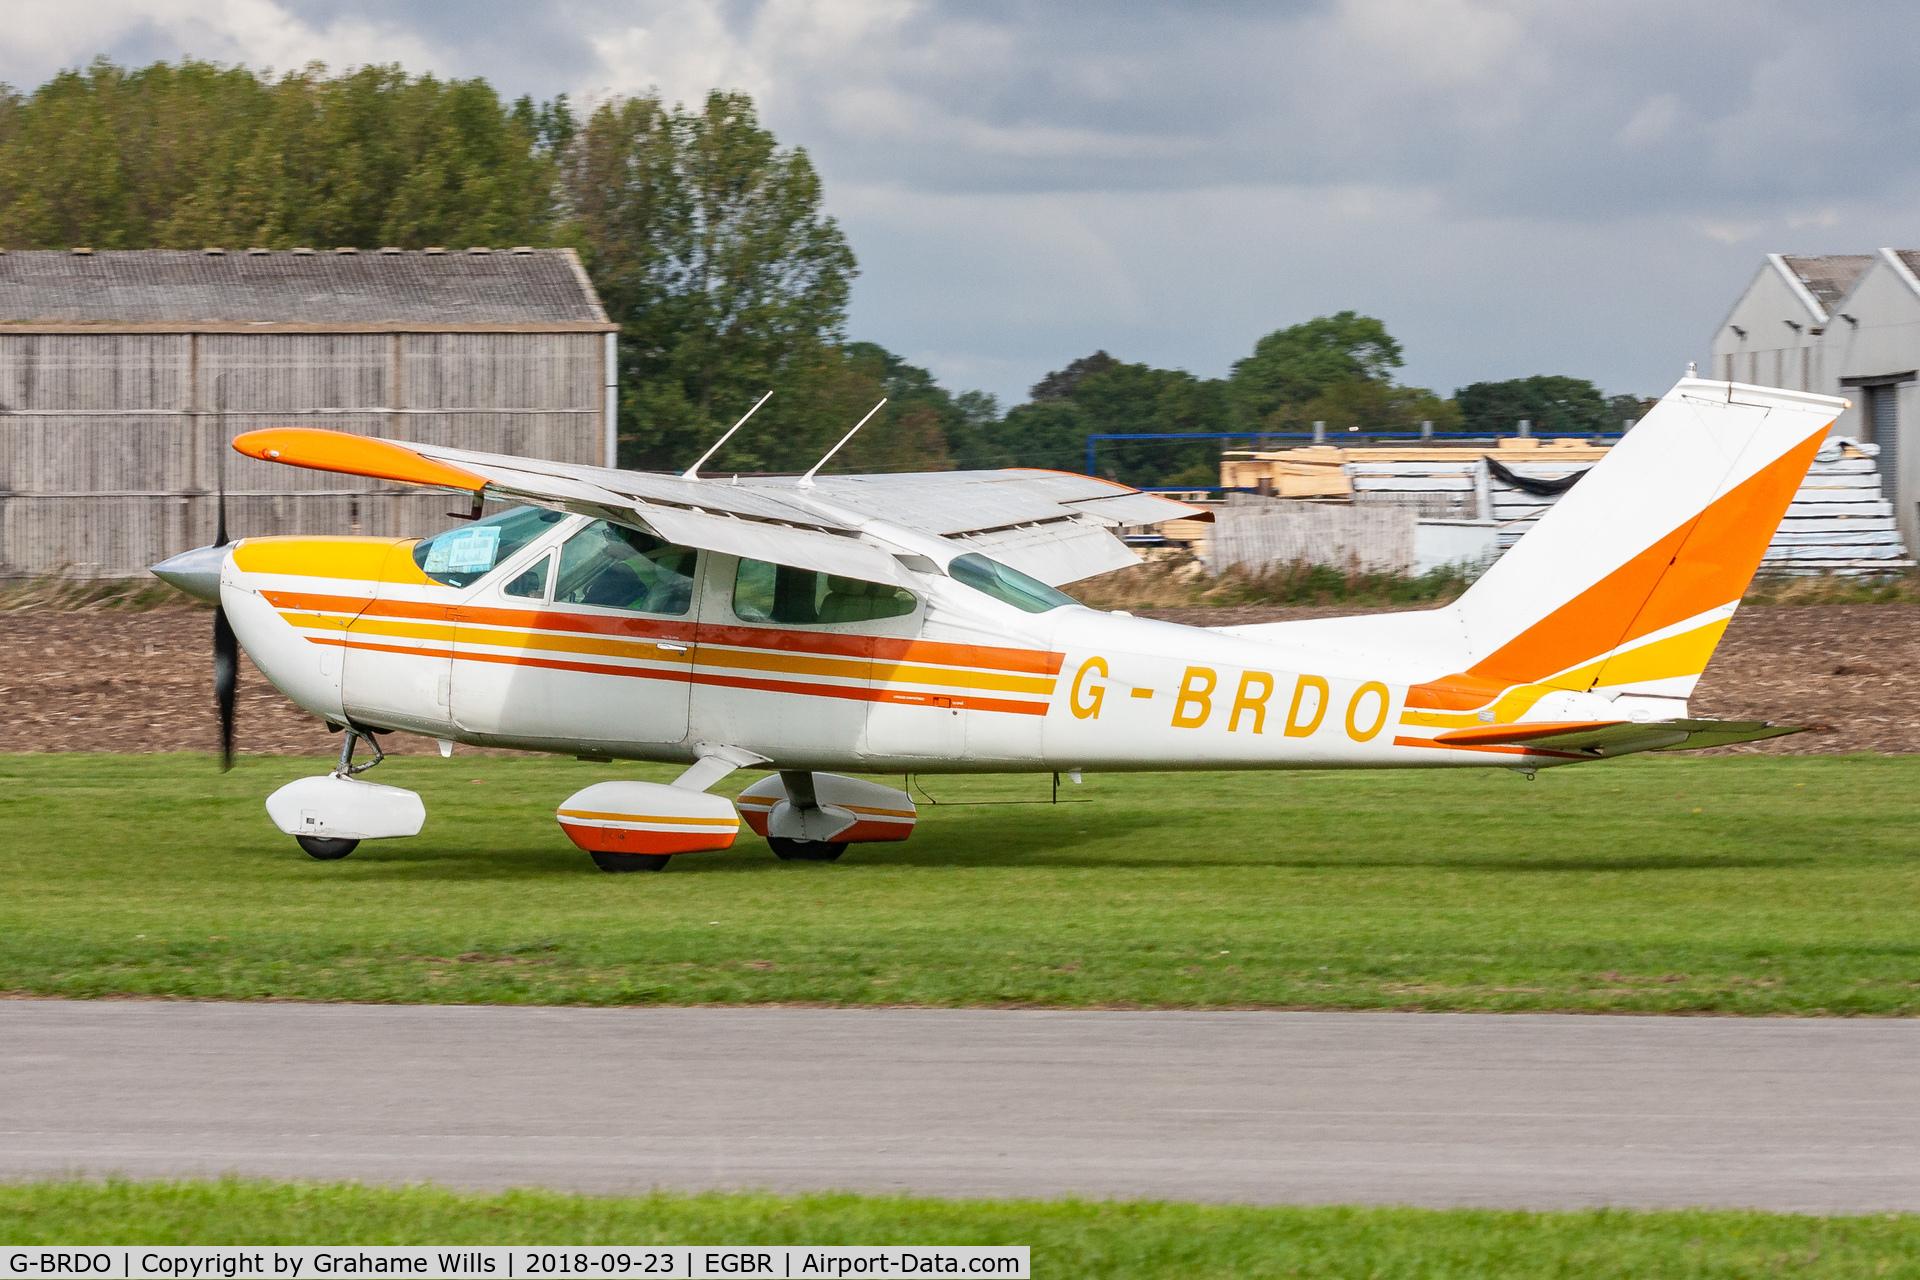 G-BRDO, 1975 Cessna 177B Cardinal C/N 17702166, Cessna 177B G-BRDO Cardinal Aviation, Breighton 23/9/18